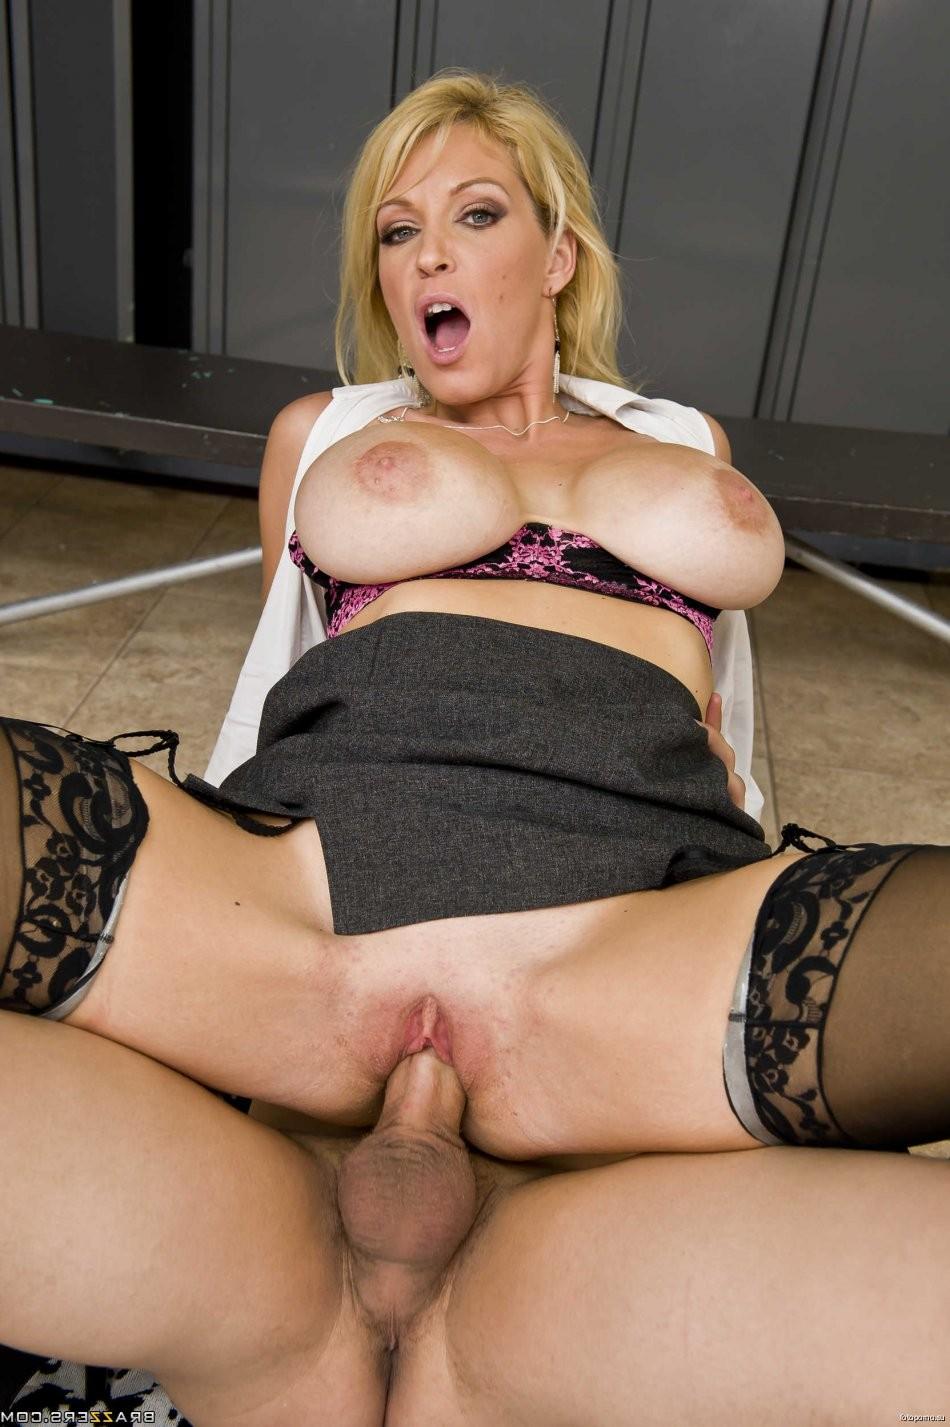 pyle driver sex position – Erotic